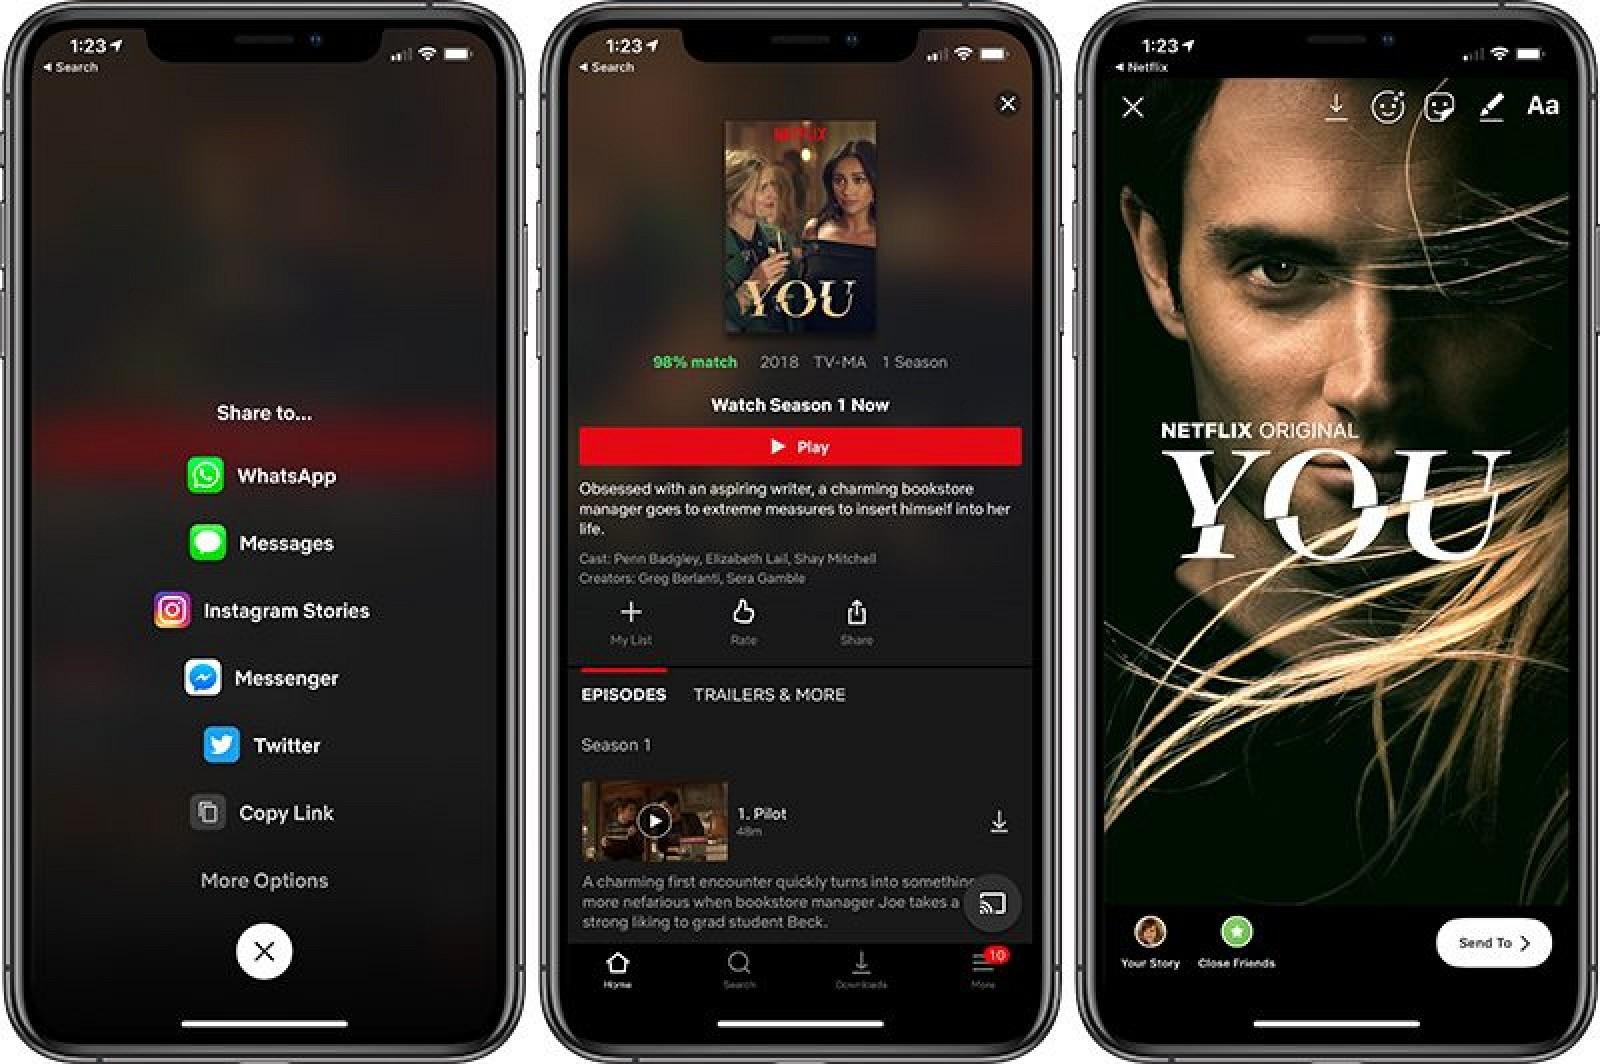 Netflix Instagram Stories integration